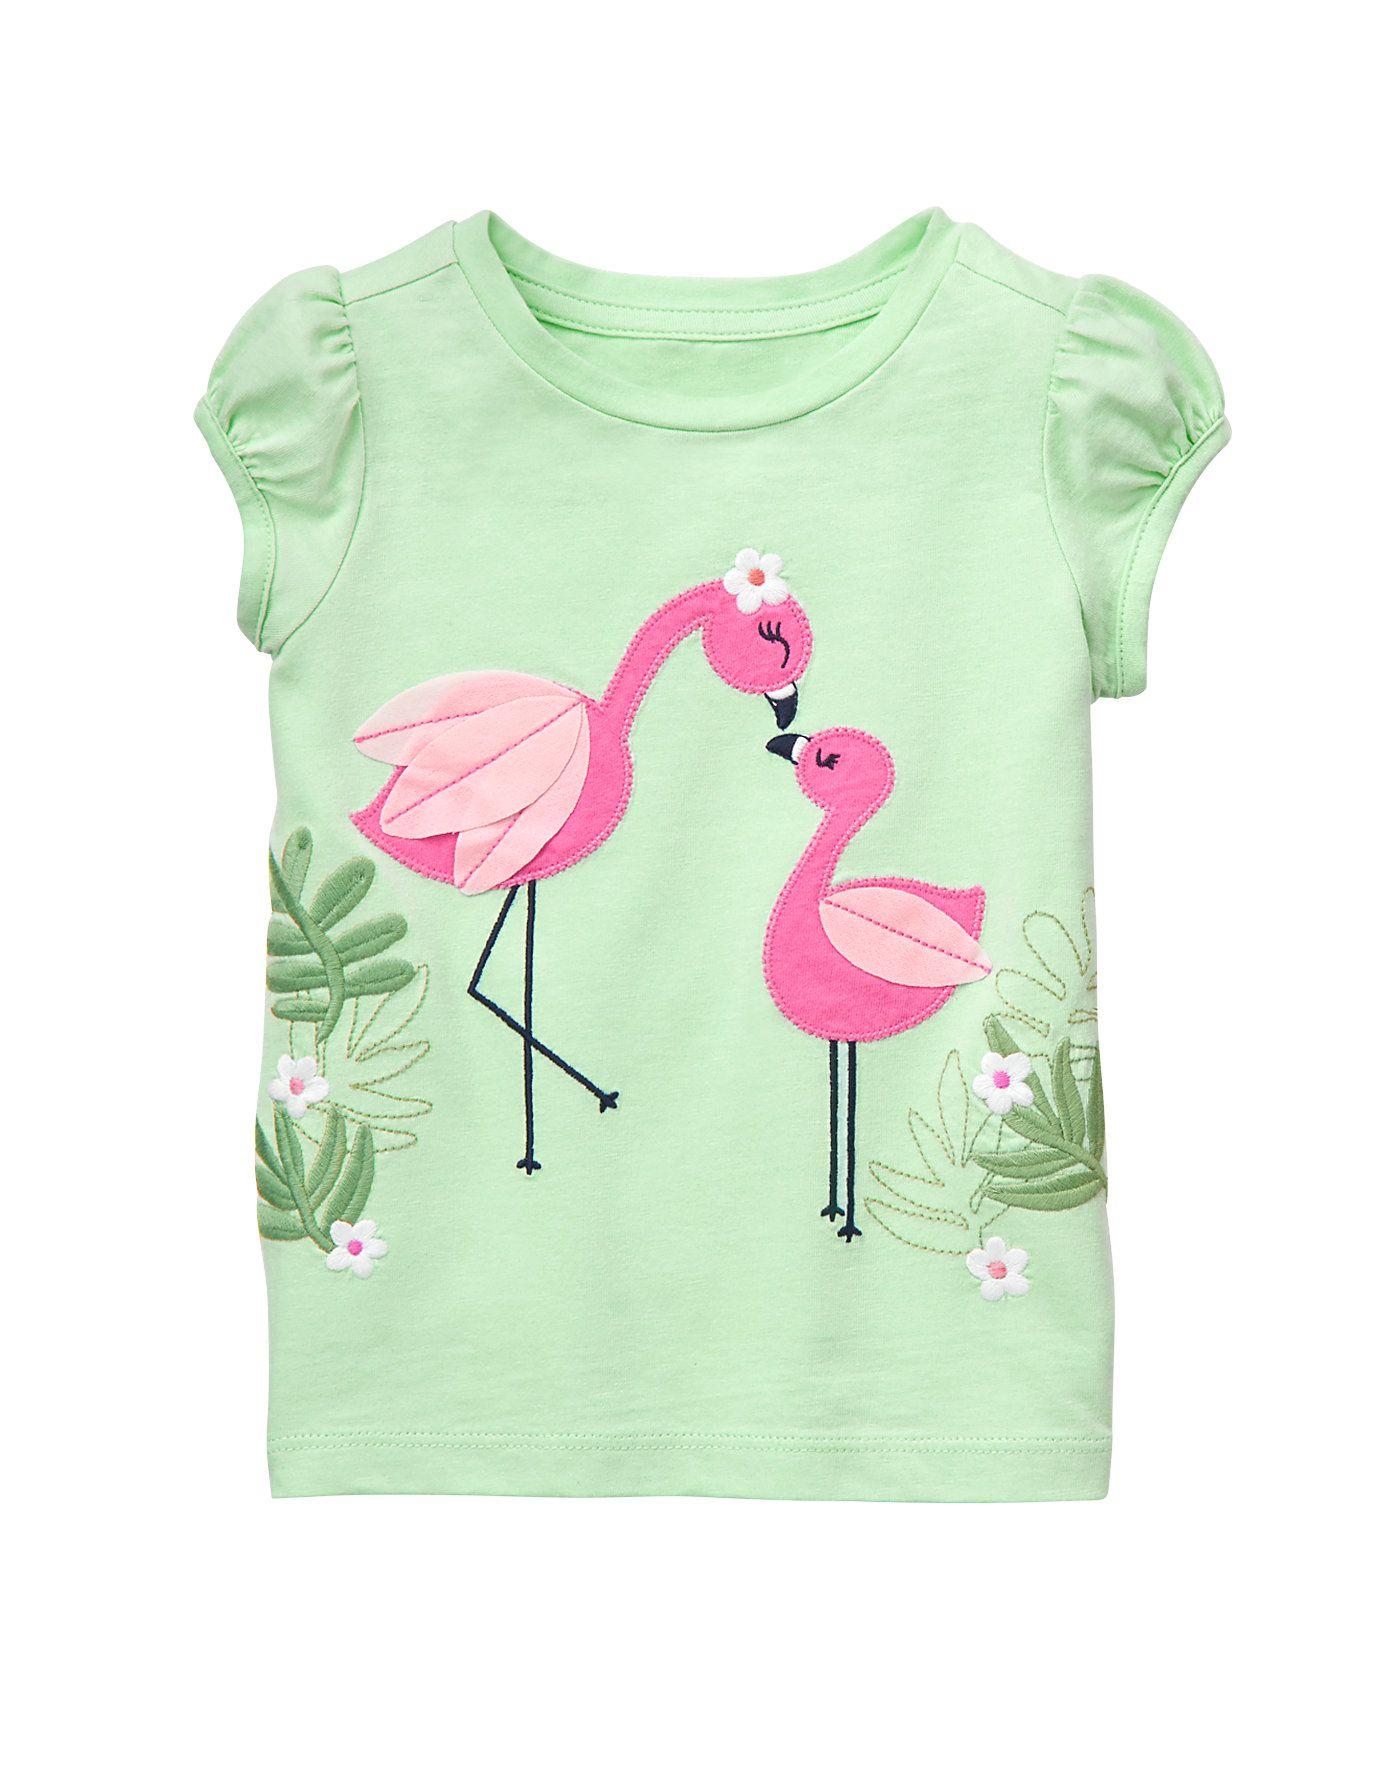 26d53a67b Flamingo Friends Top @gymboree | niño | Trajes para niños ...